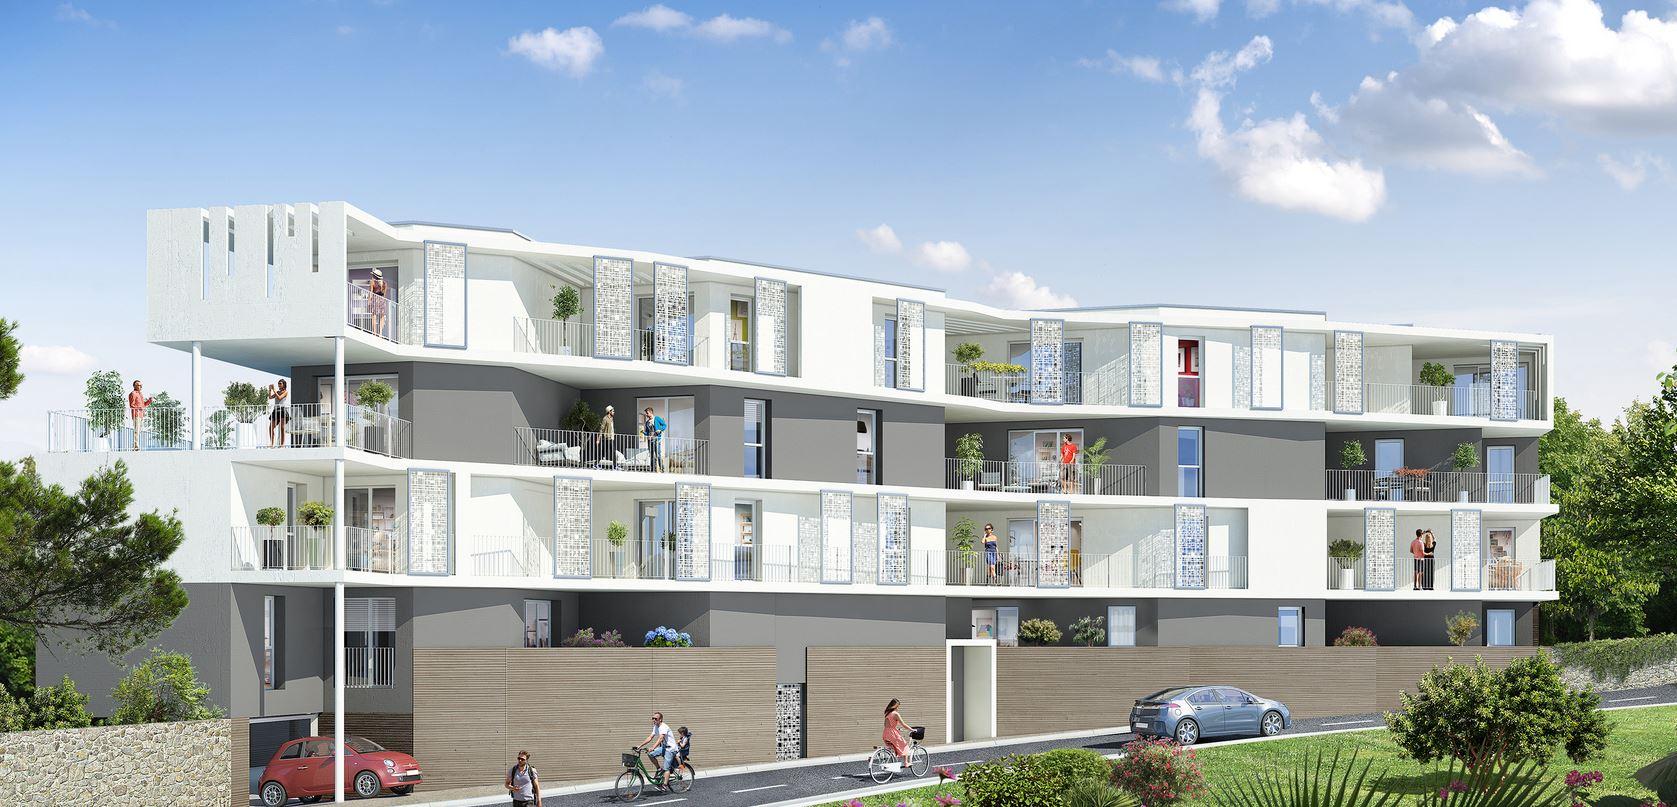 Immobilier neuf Sète : n'attendez plus !